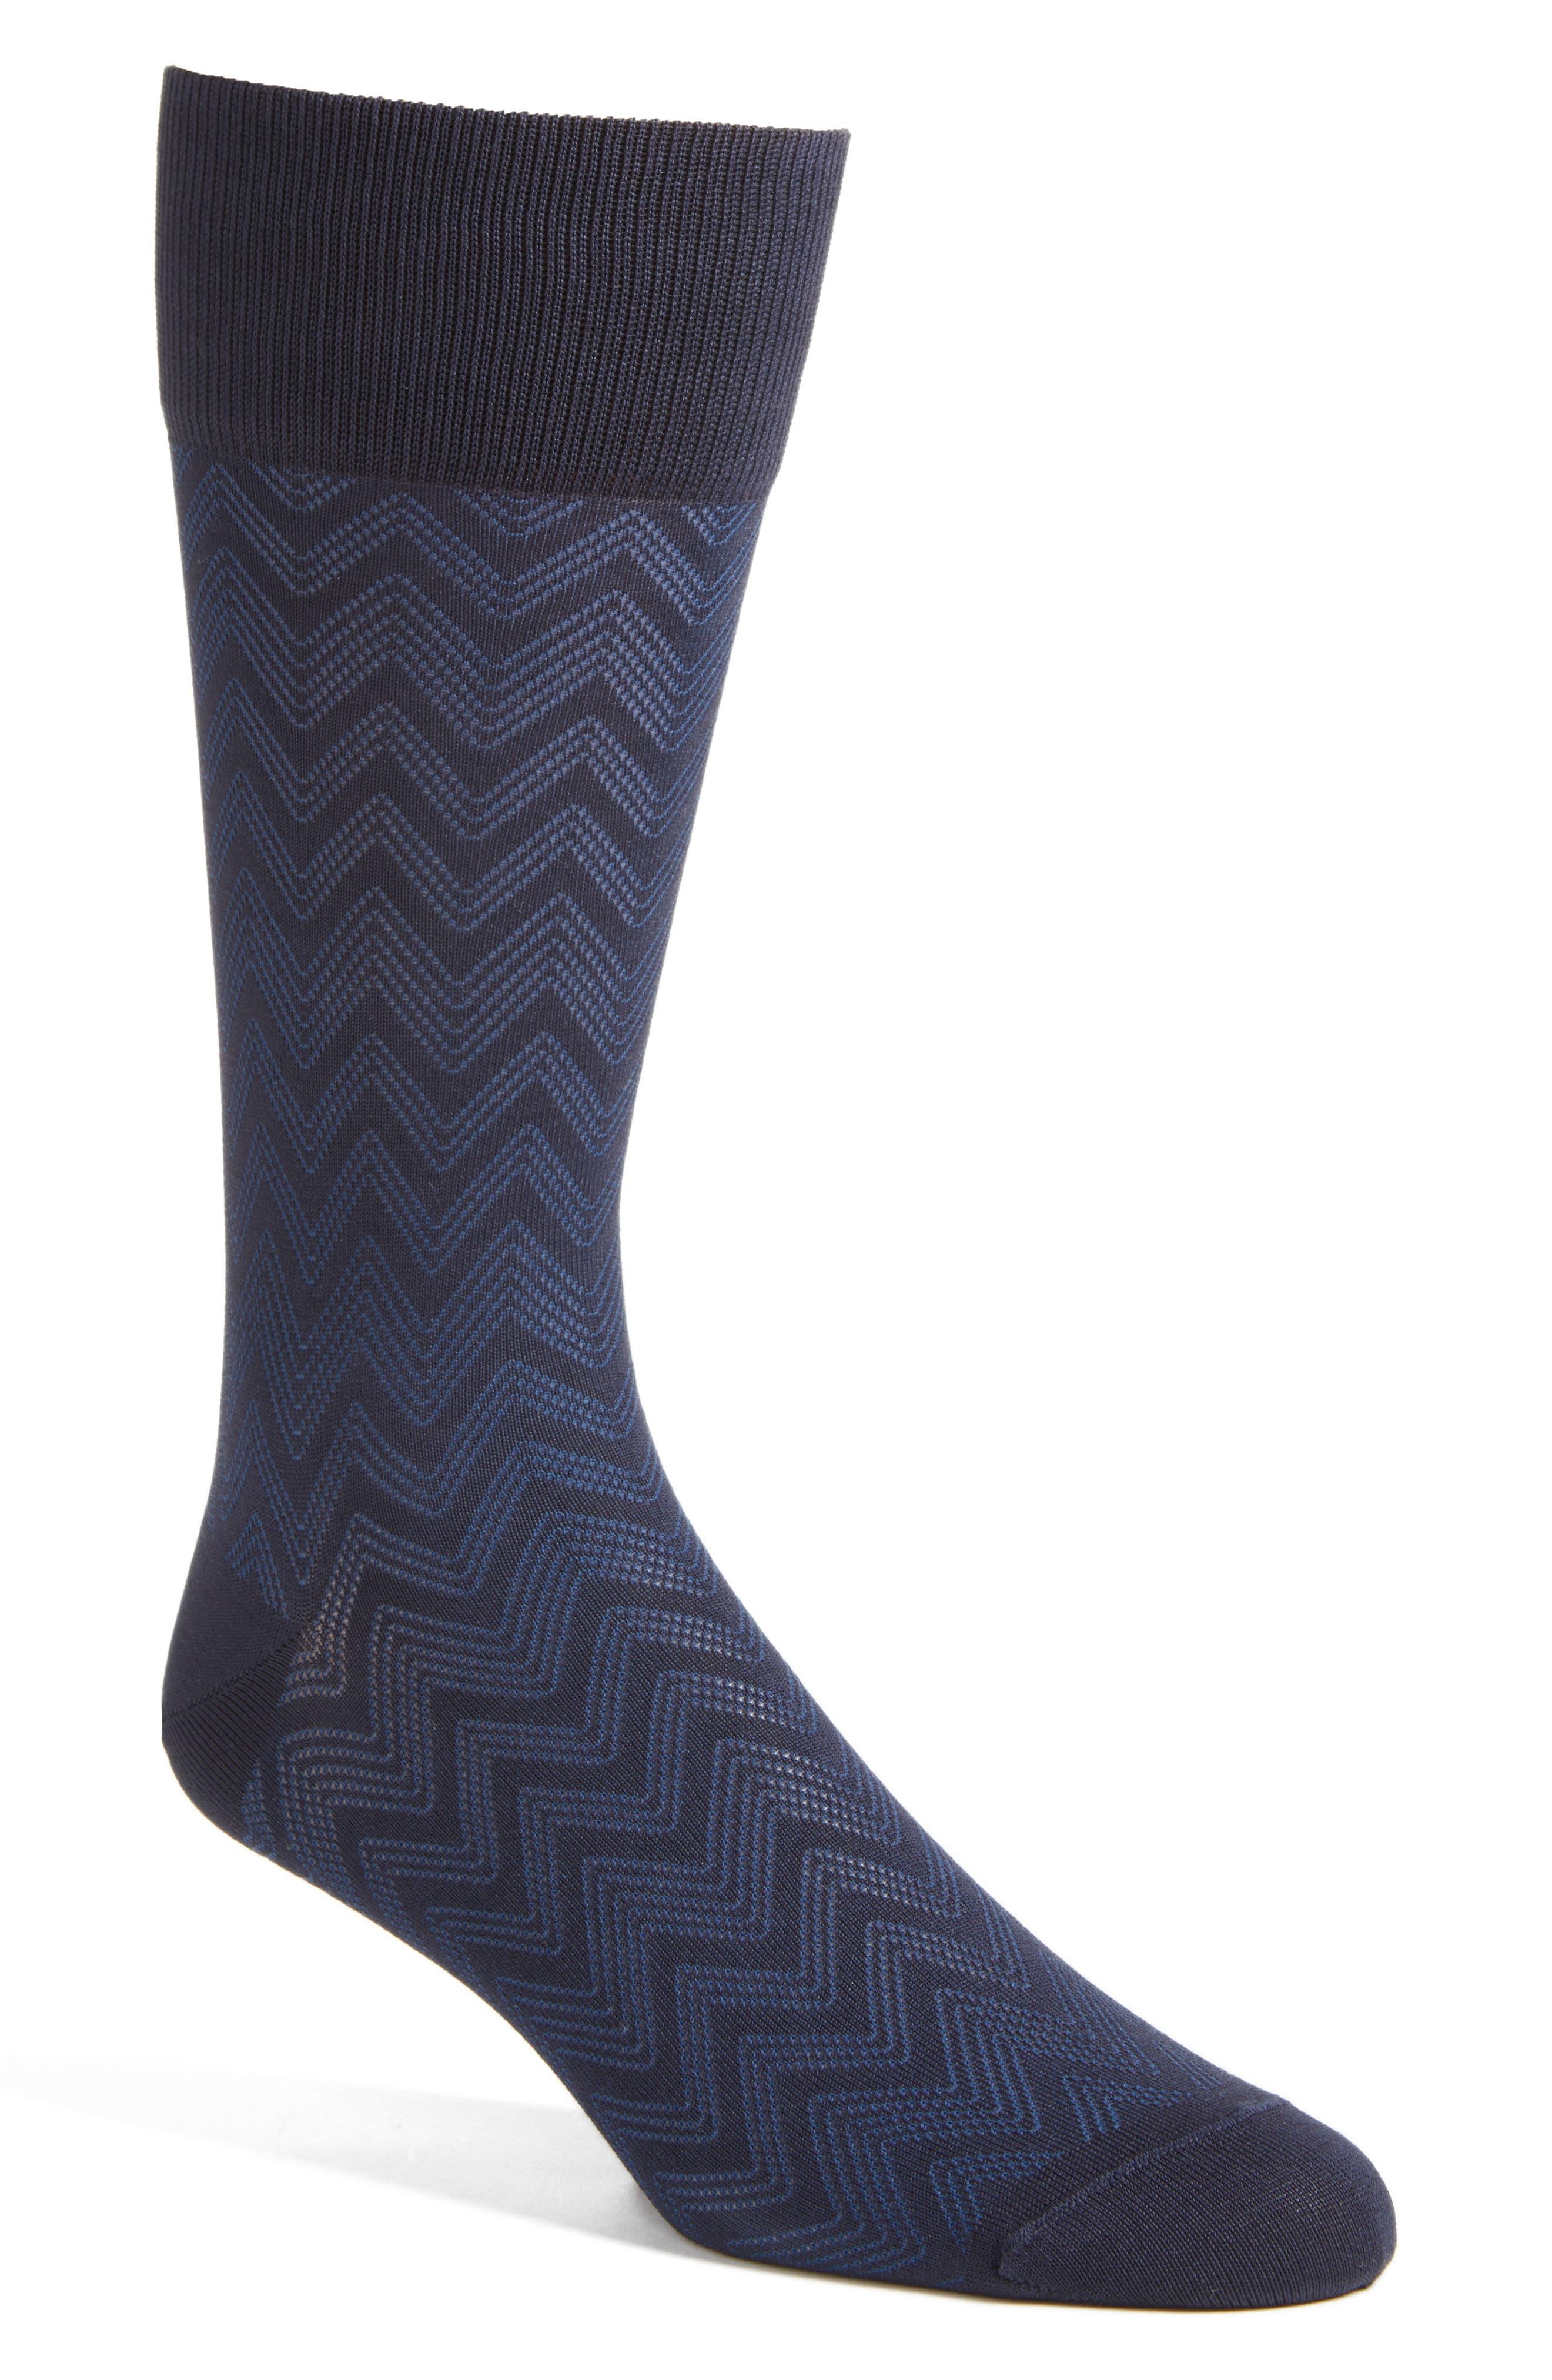 Chevron Socks,                             Main thumbnail 1, color,                             Navy